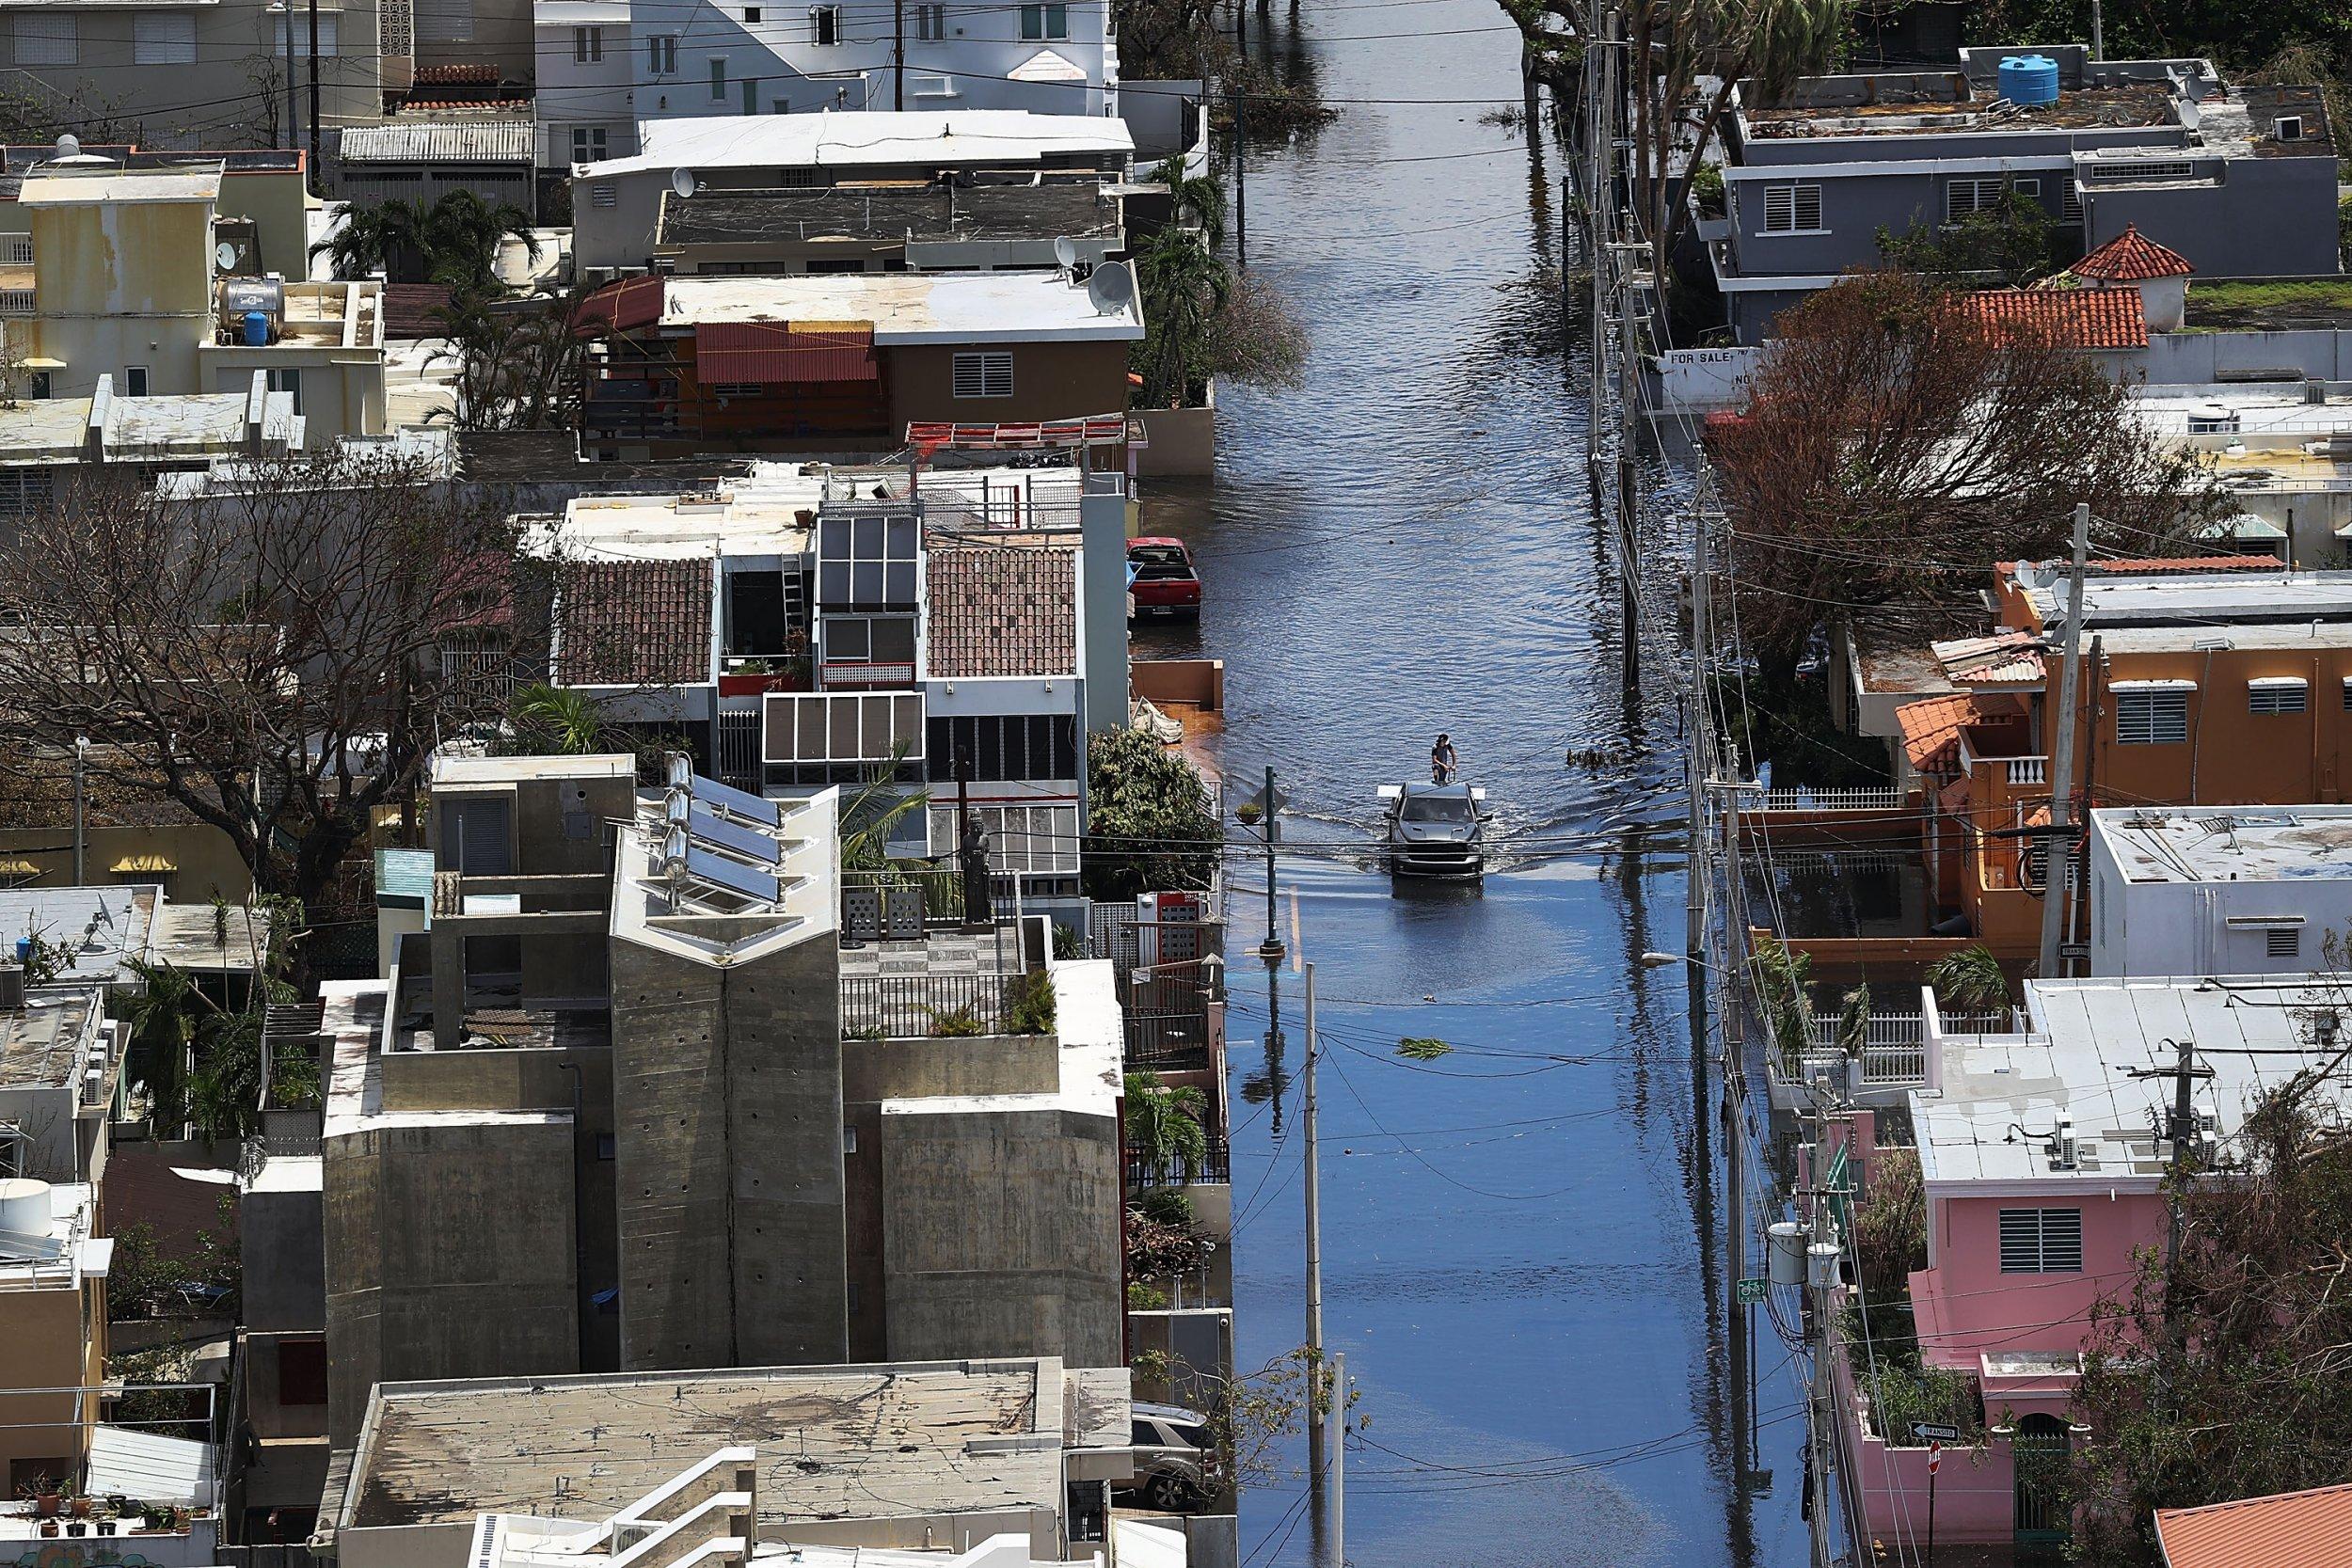 Puerto Rico Recovery 8